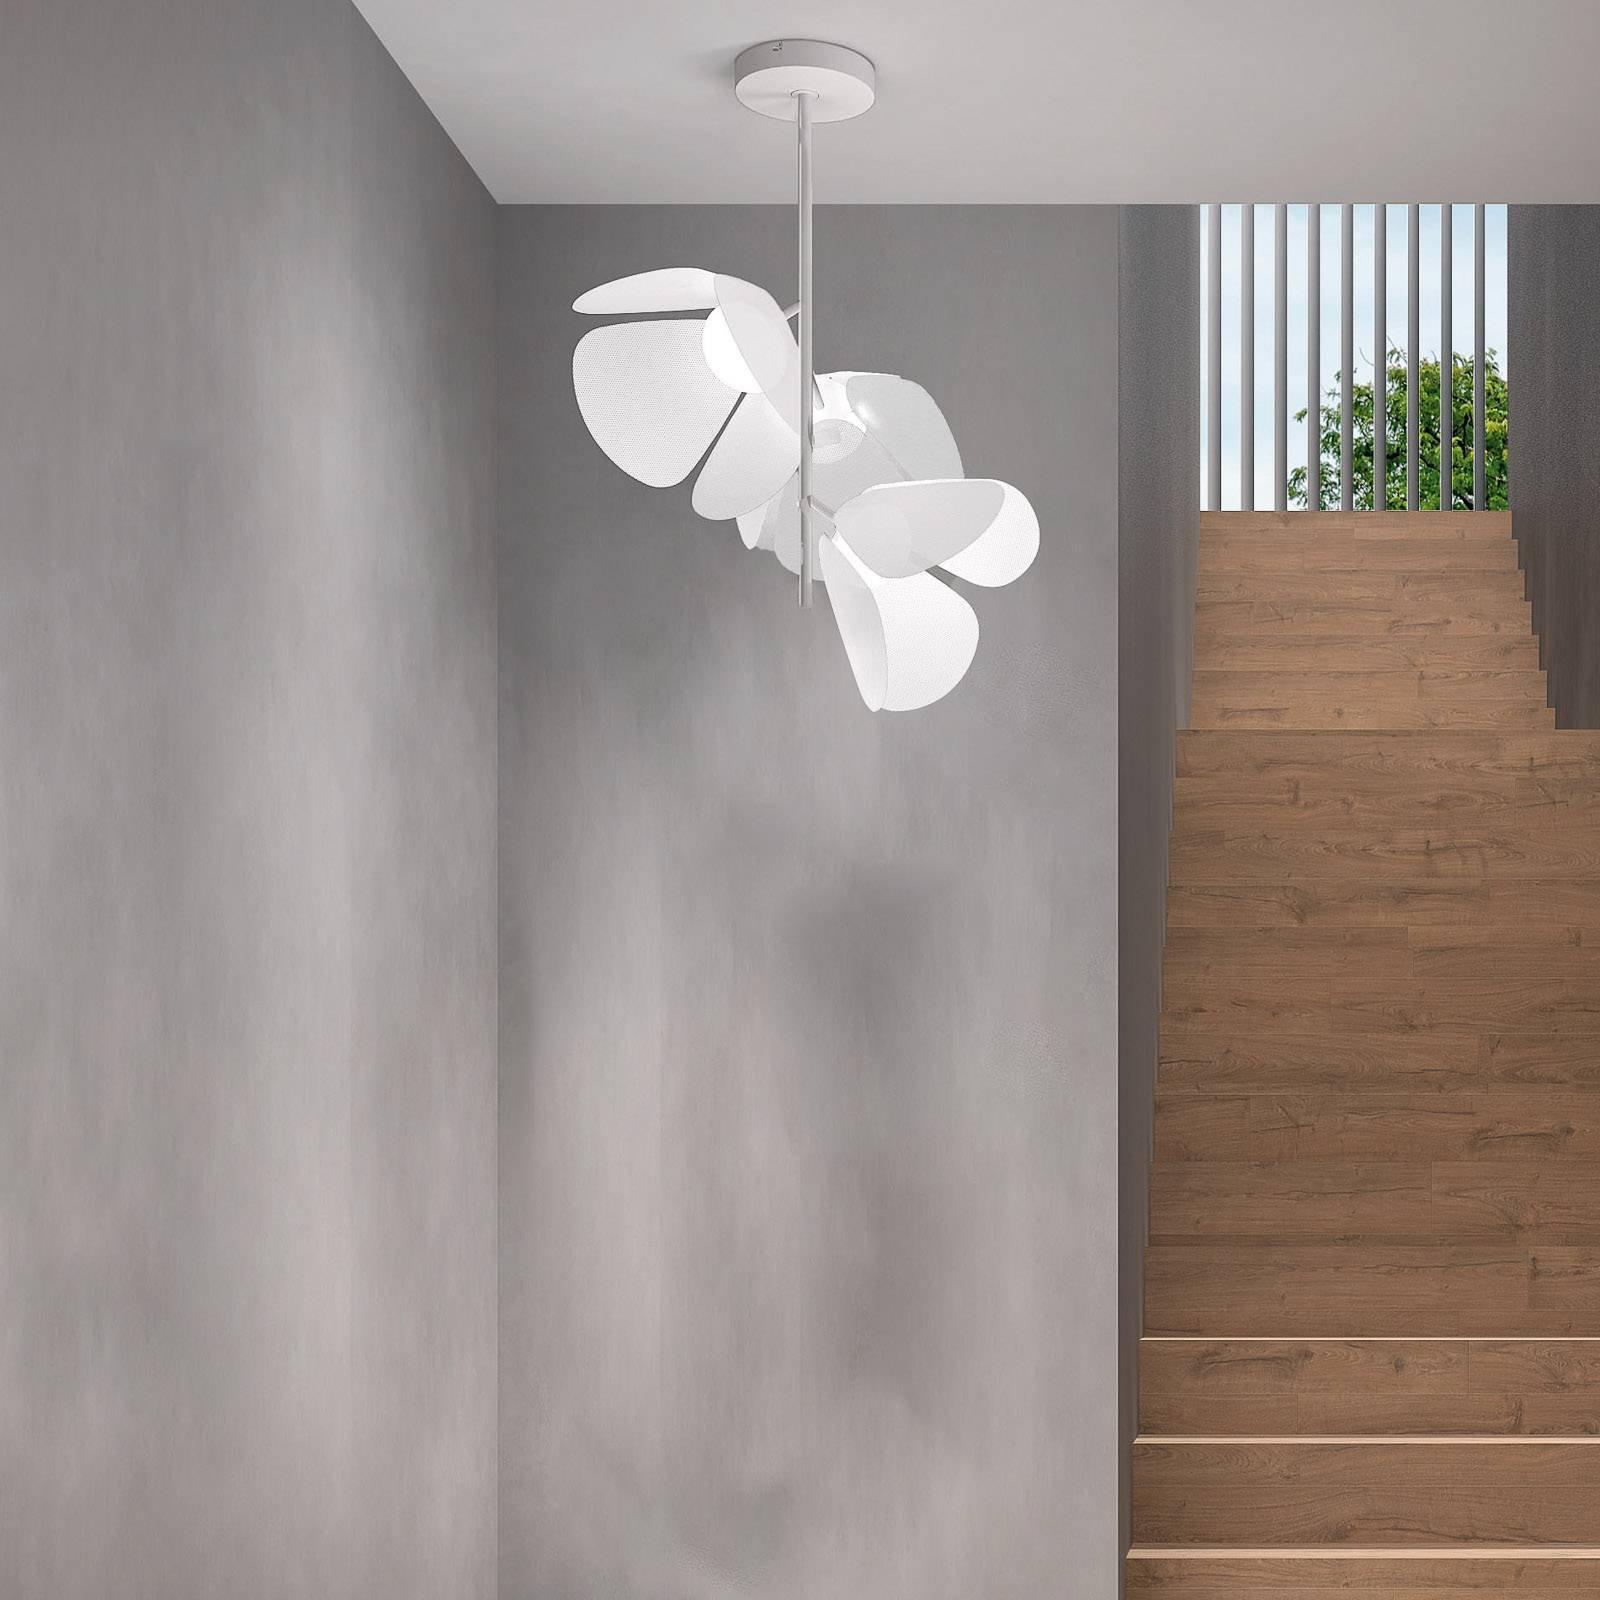 Bover Mod PF/73/3L LED-taklampe, hvit